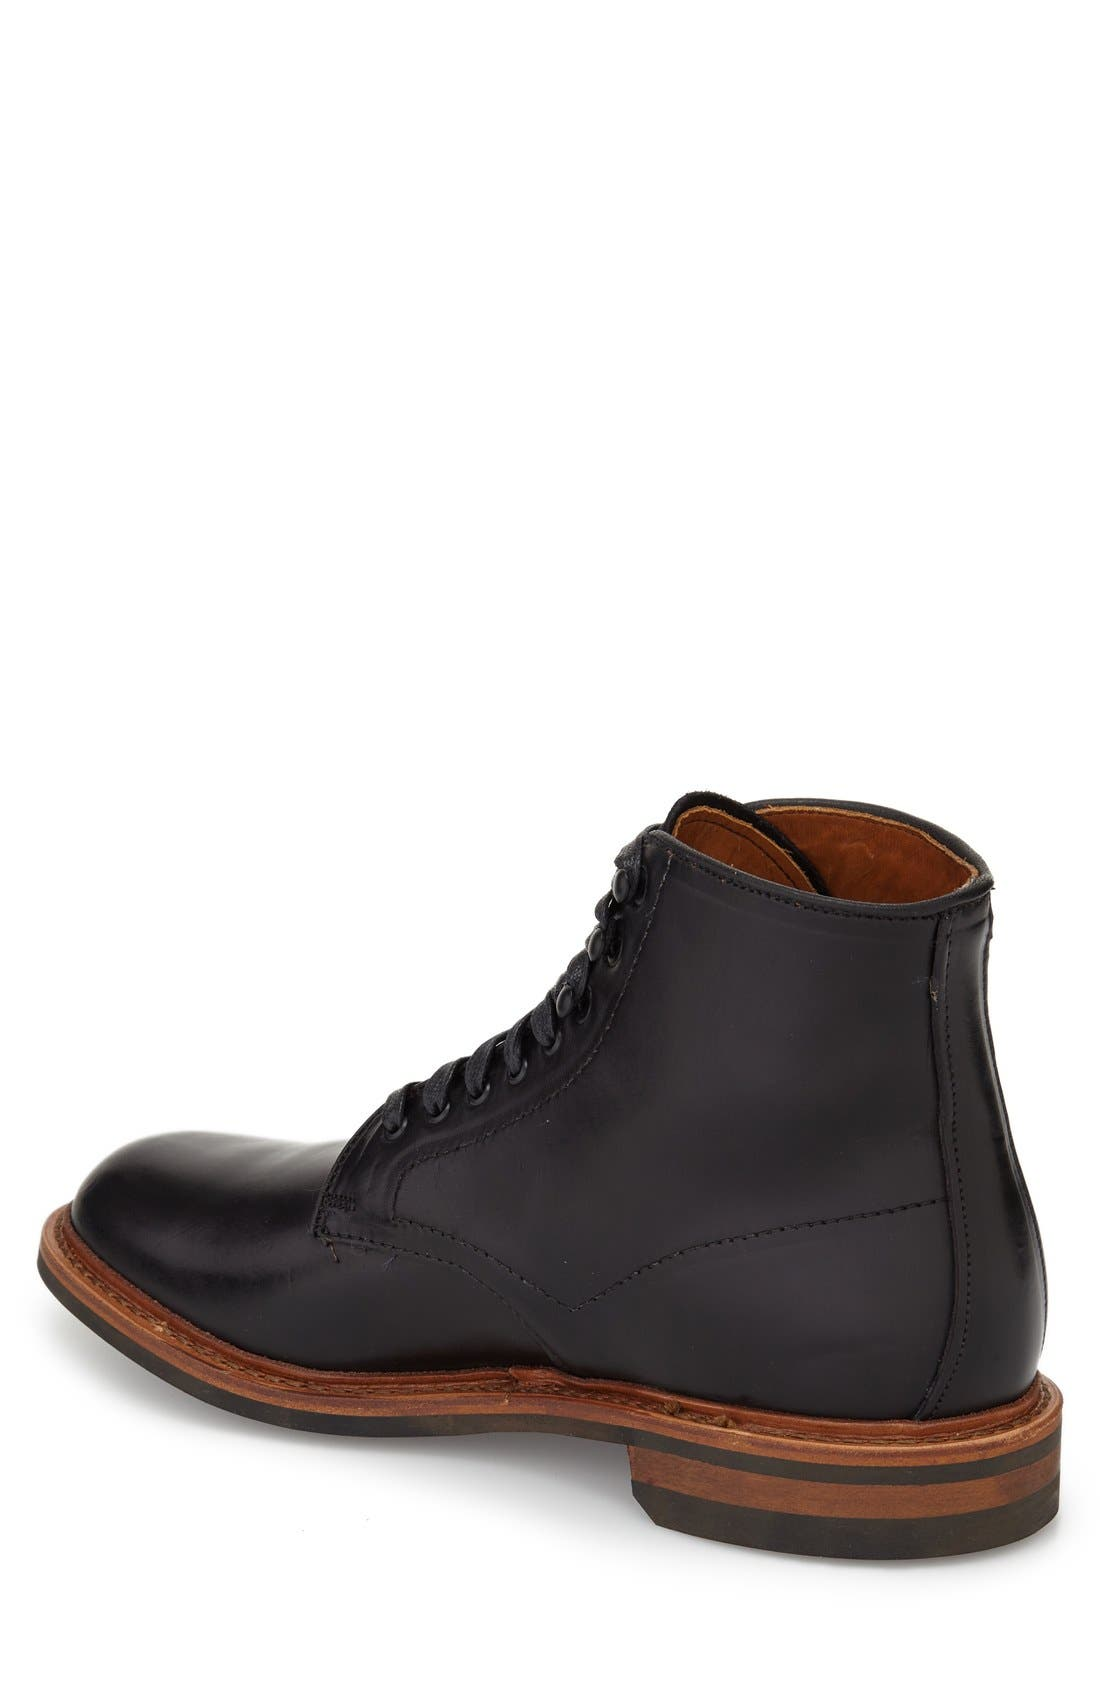 ALLEN EDMONDS, 'Higgins Mill' Plain Toe Boot, Alternate thumbnail 2, color, 001